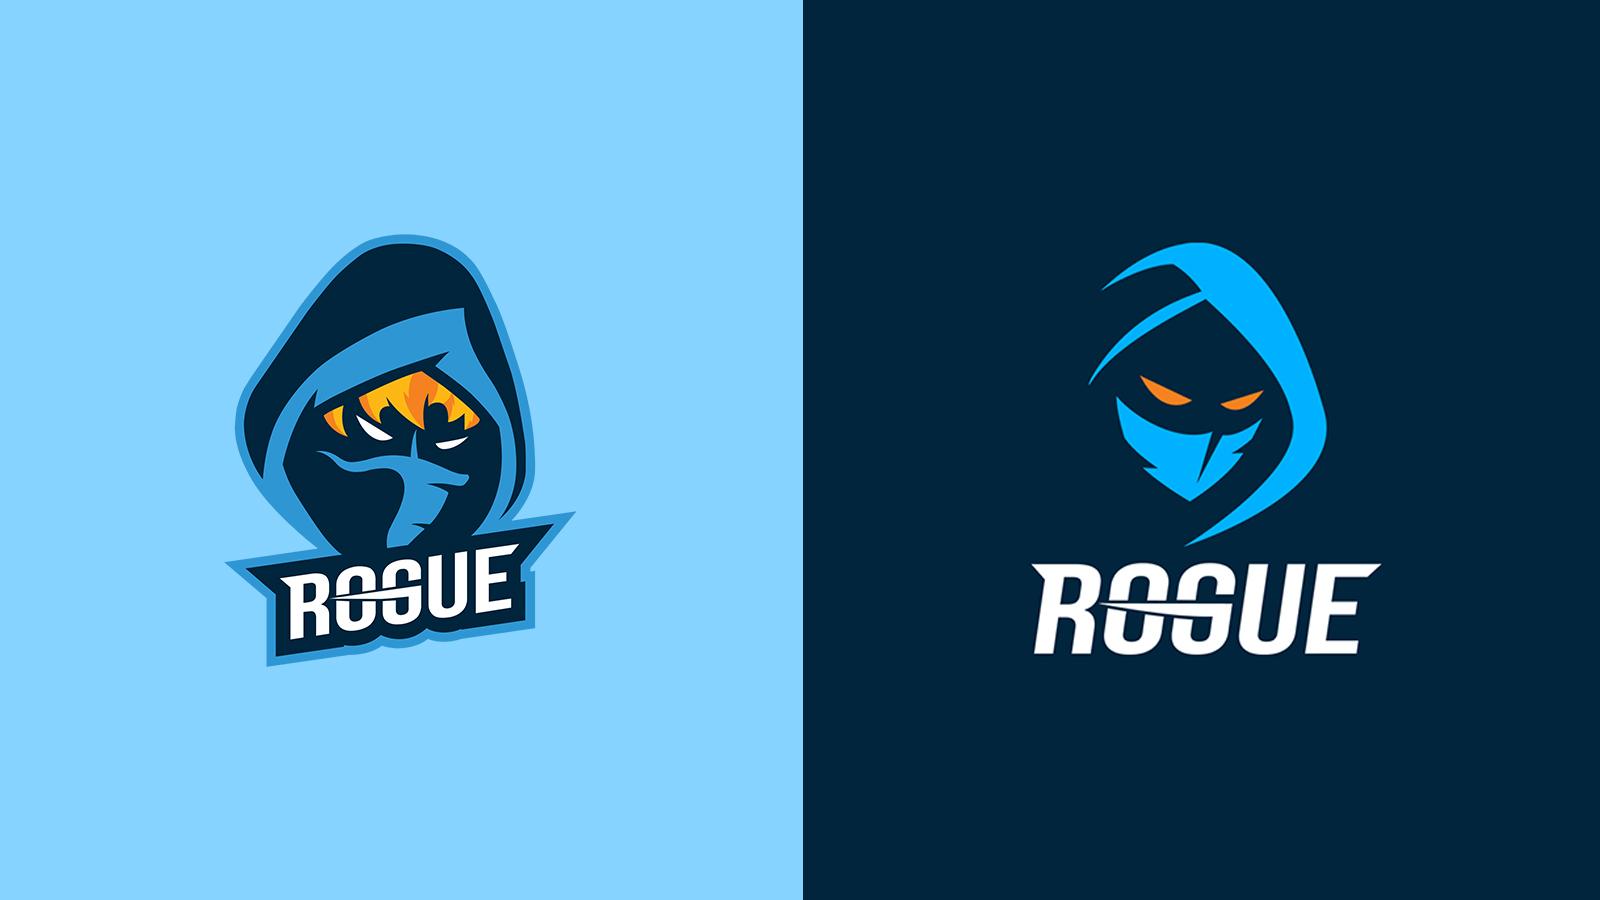 Rogue Old and New Logos